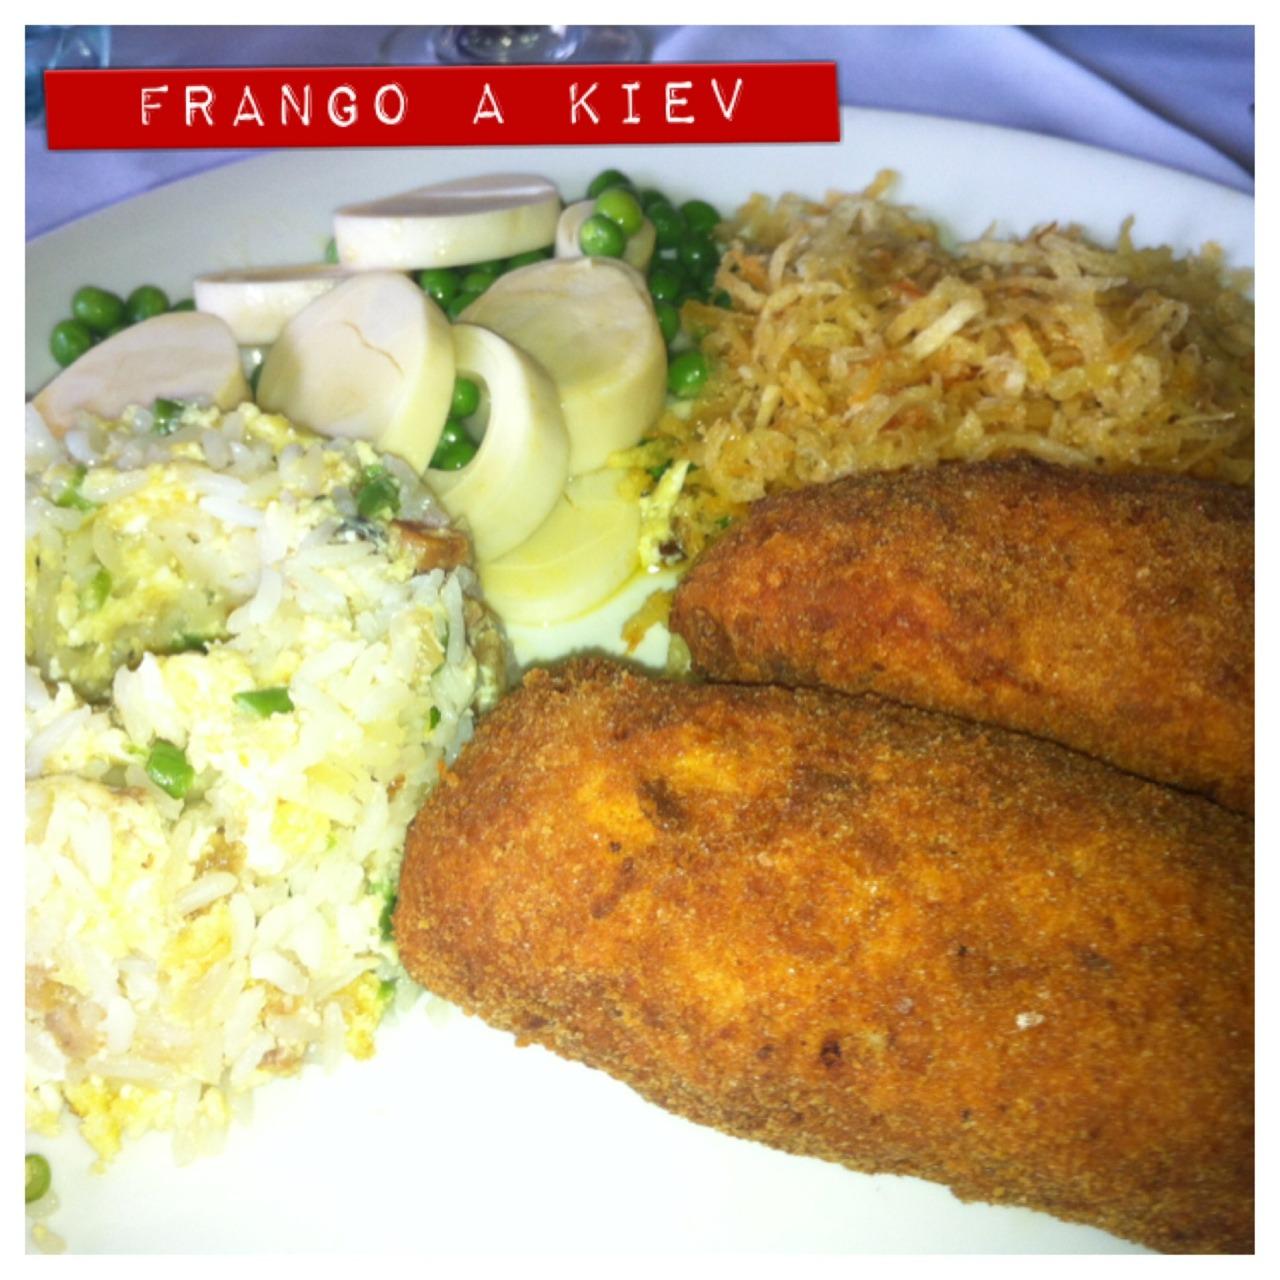 FRANGO À KIEV